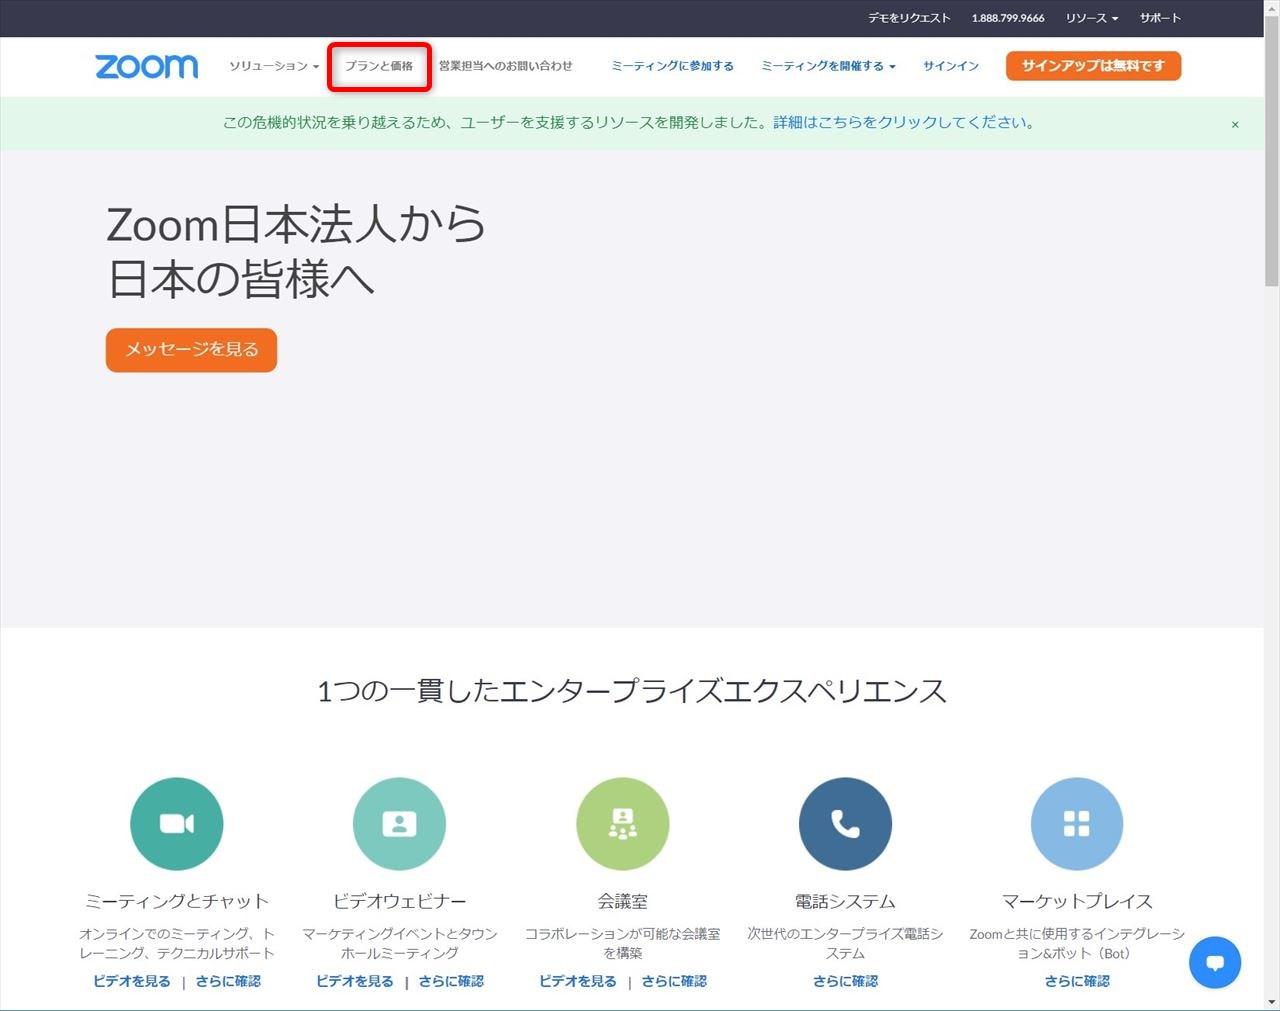 01Zoomの基本画面